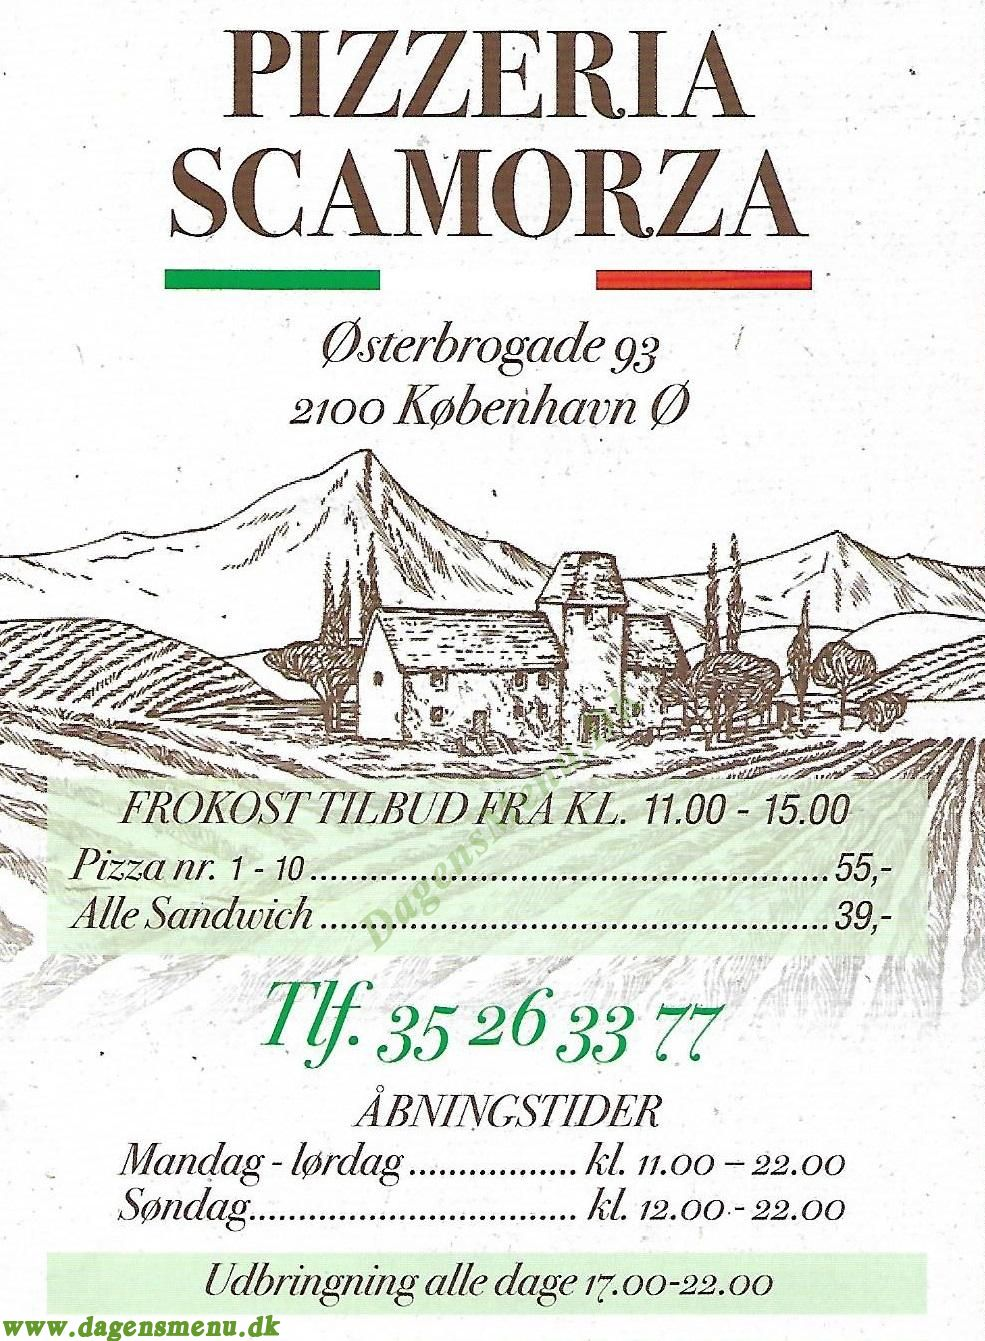 Pizzeria Scamorza - Menukort